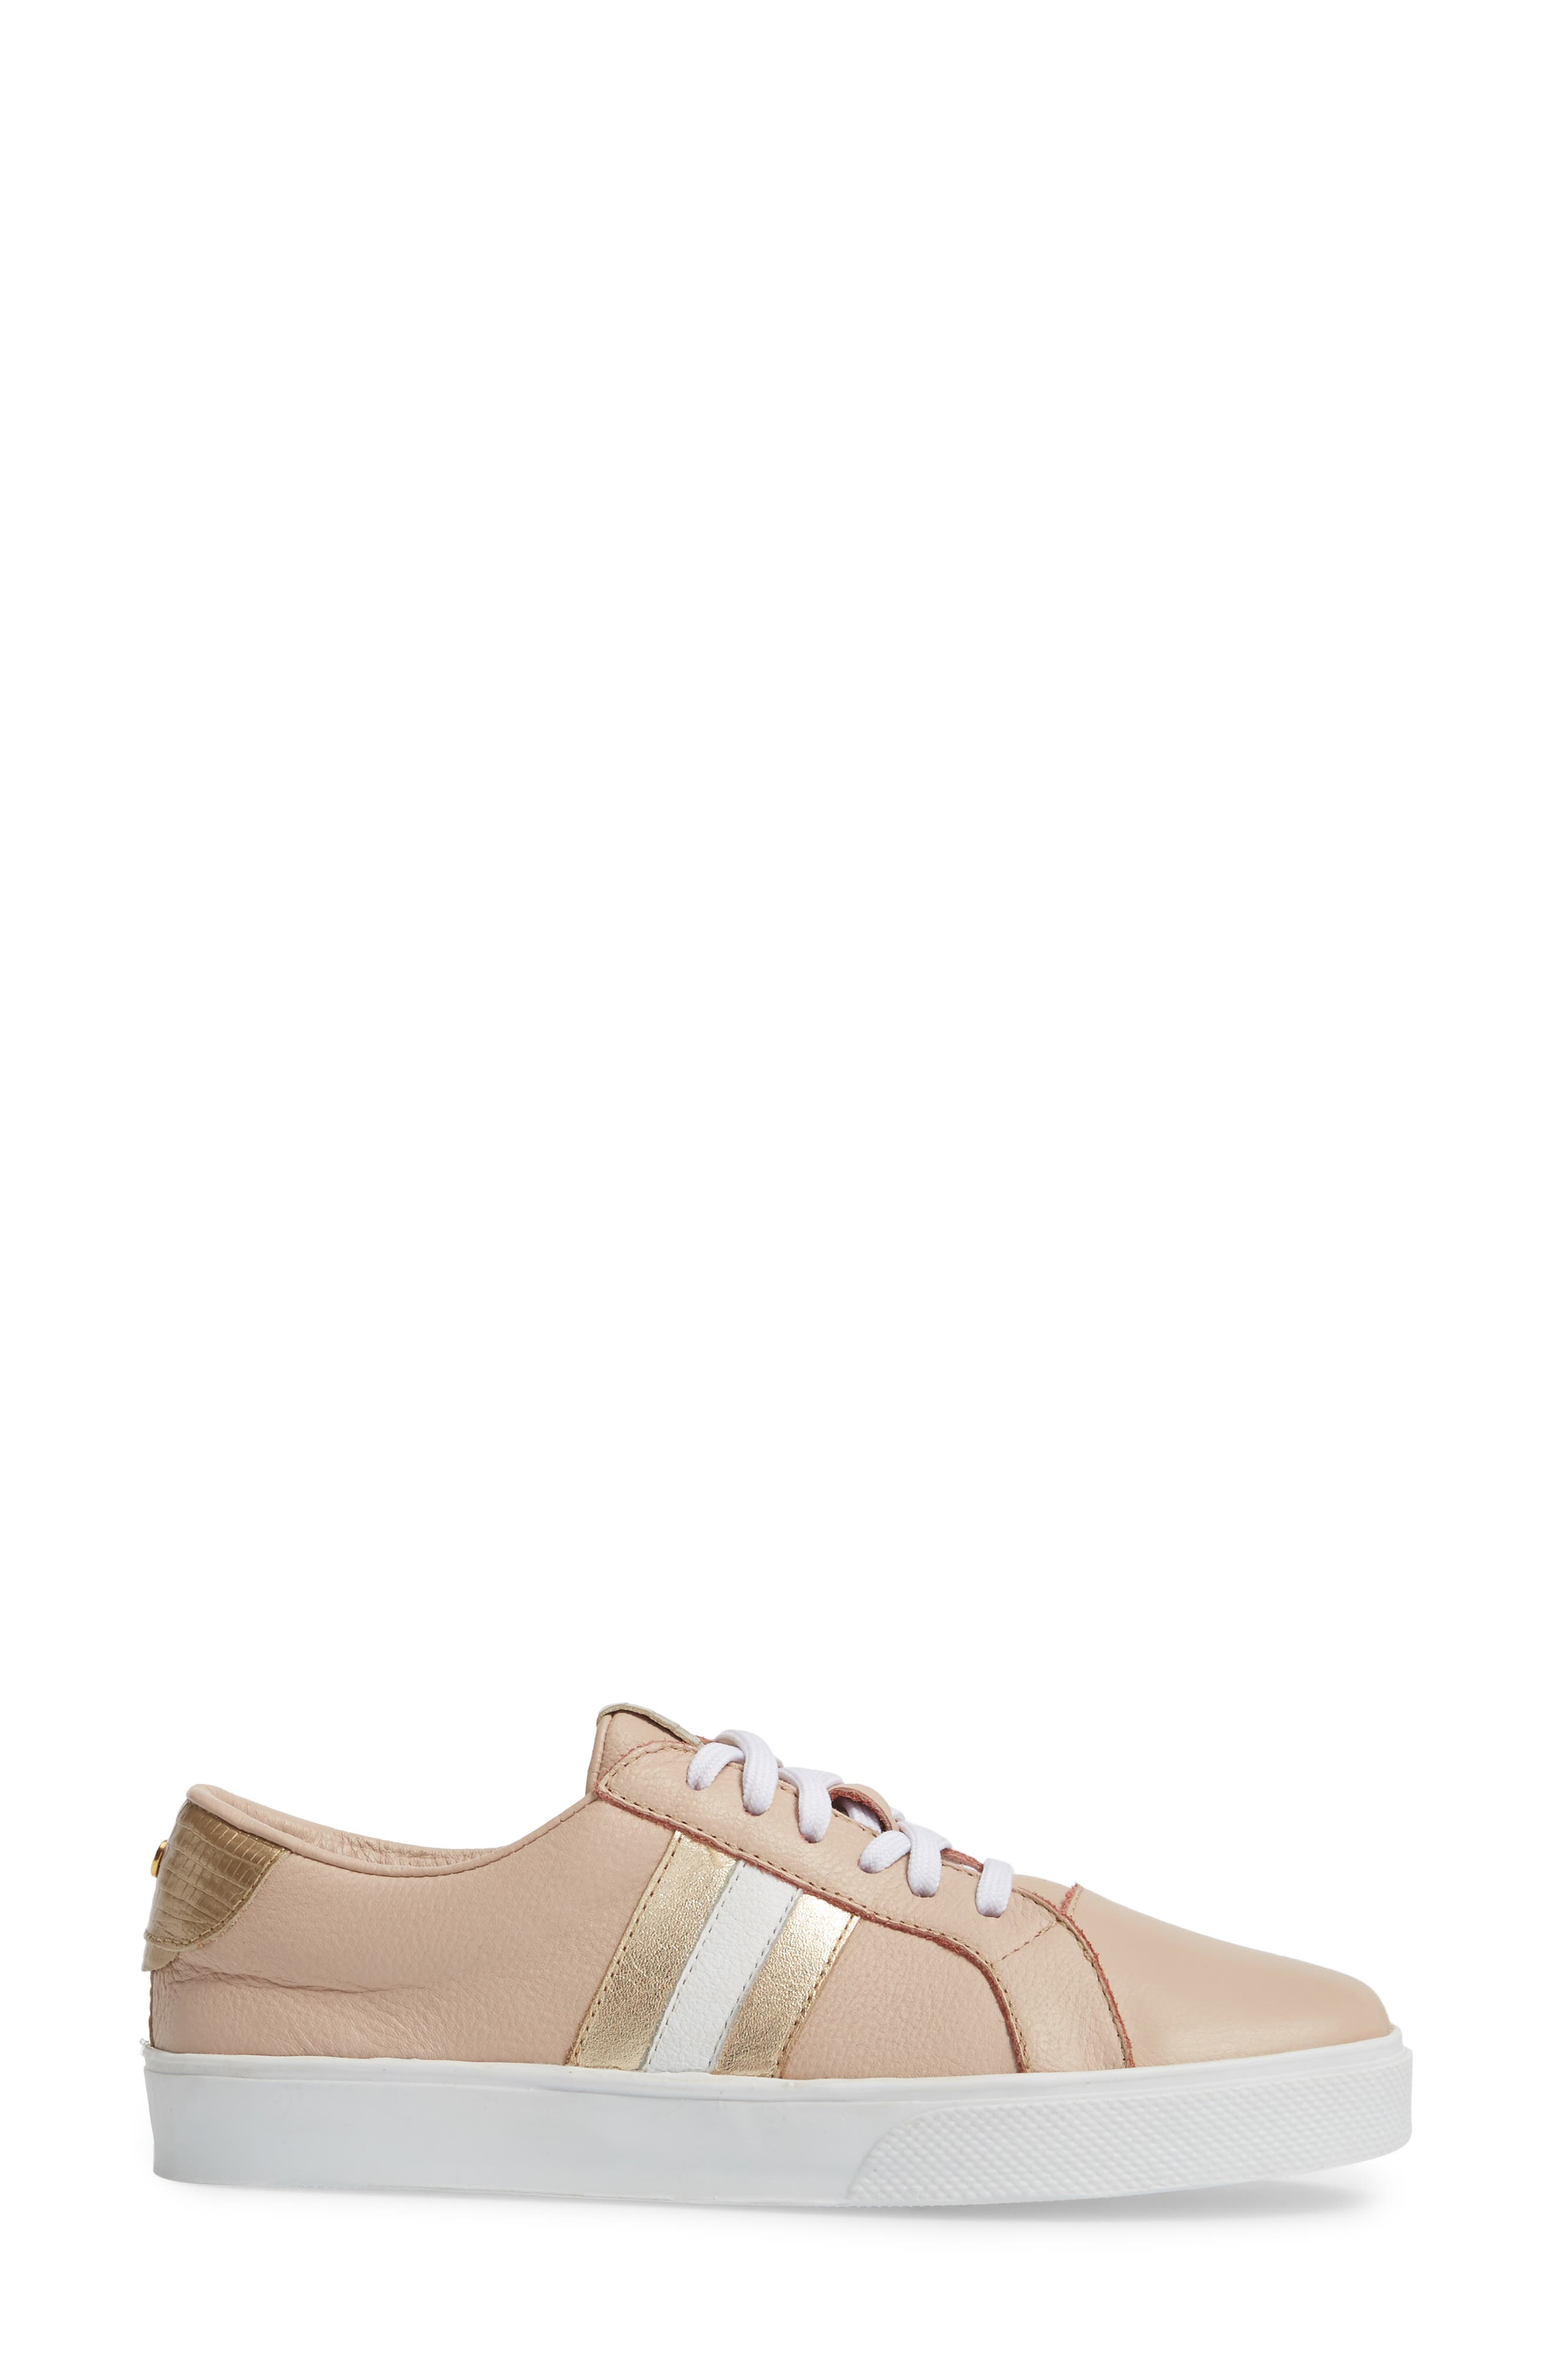 Tatacoa Low Top Sneaker,                             Alternate thumbnail 3, color,                             Blush